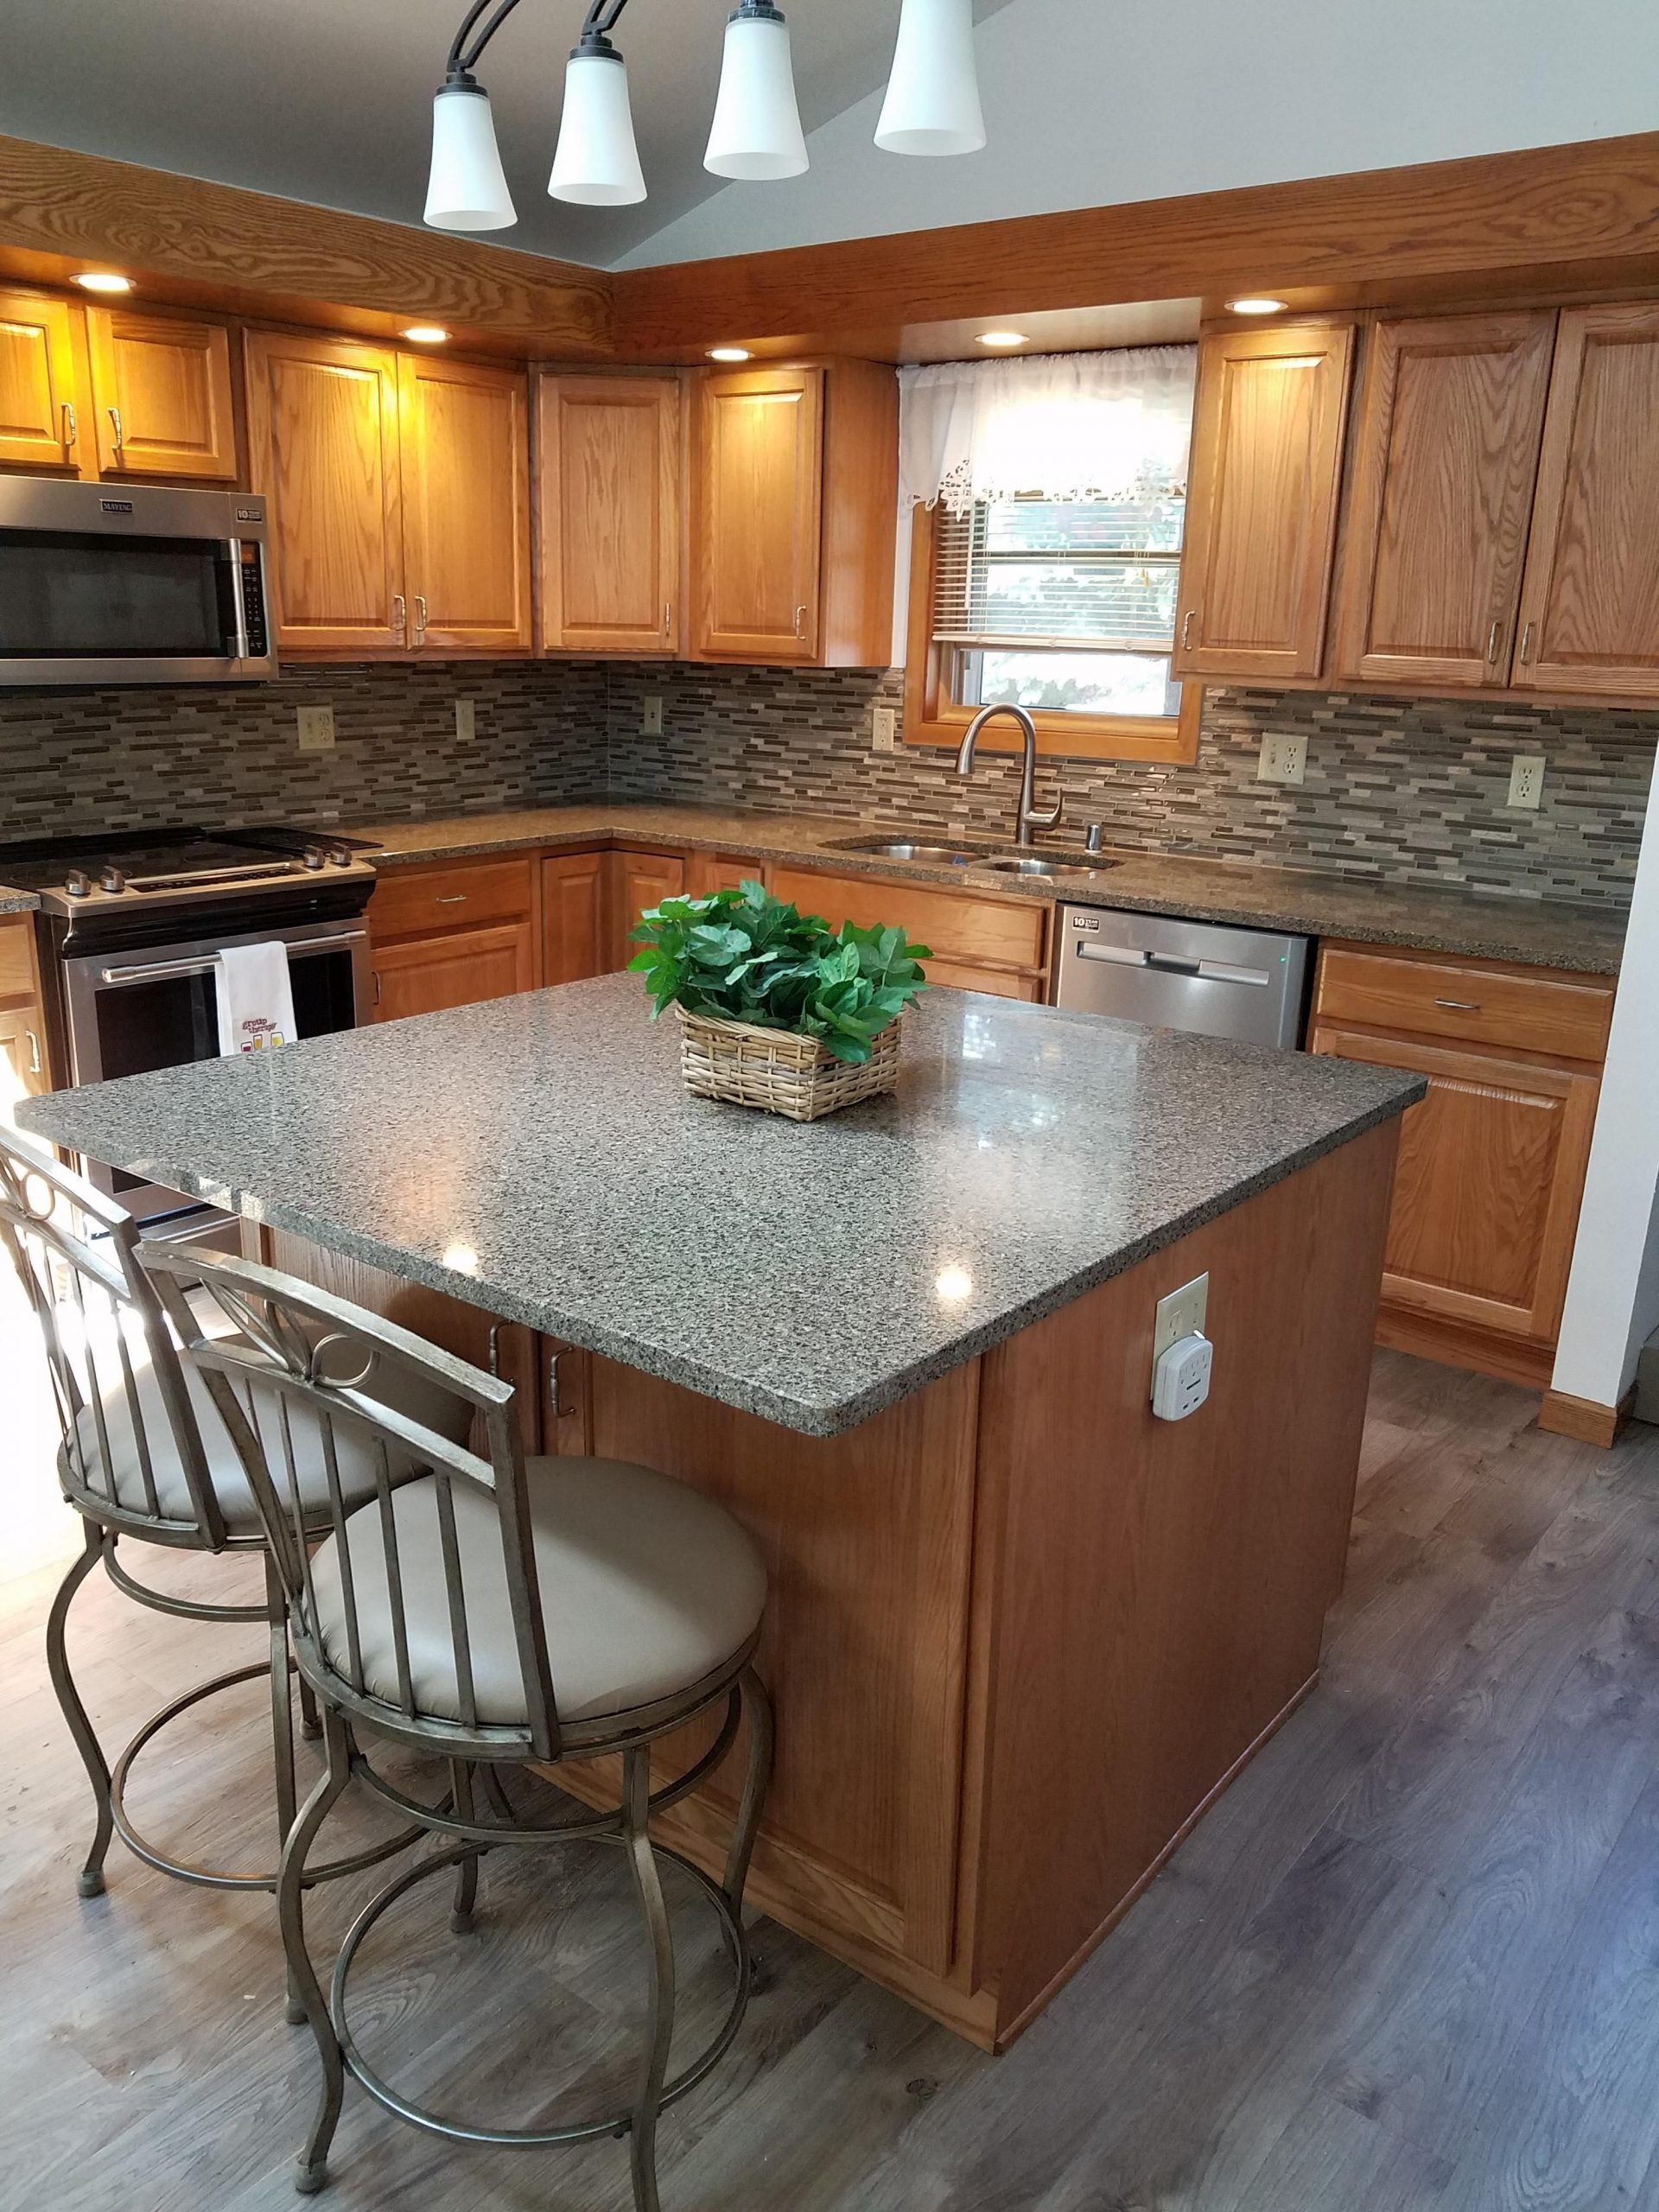 The Warm Toned Merillat Amaretto Oak Cabinets With The Popular Seneca Ridge Door Amaretto Cabinets Door In 2020 Grey Kitchen Floor Oak Cabinets Honey Oak Cabinets